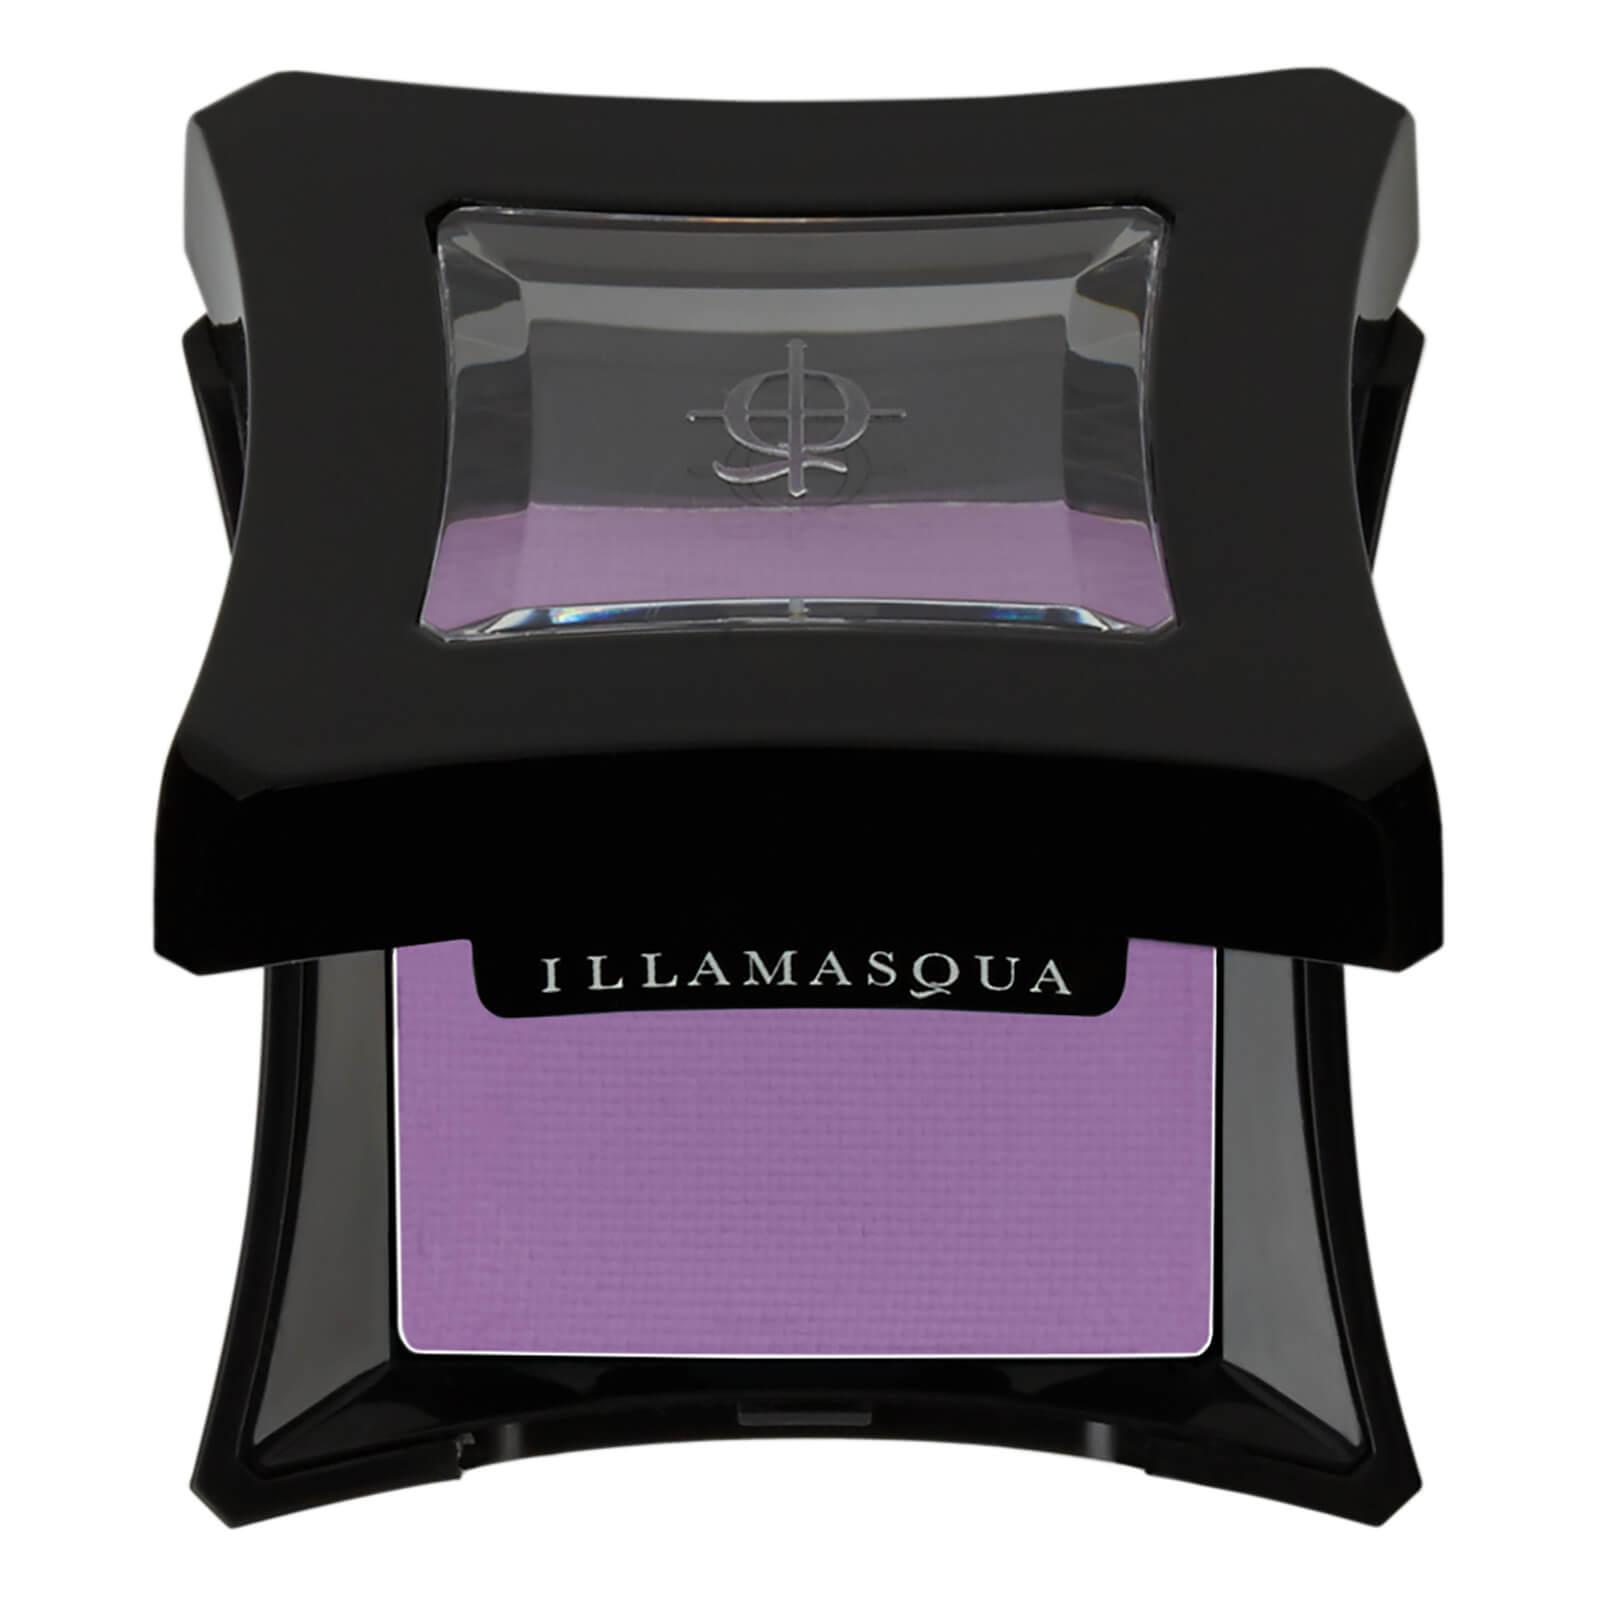 Illamasqua Powder Eye Shadow 2g (Various Shades) - CanCan